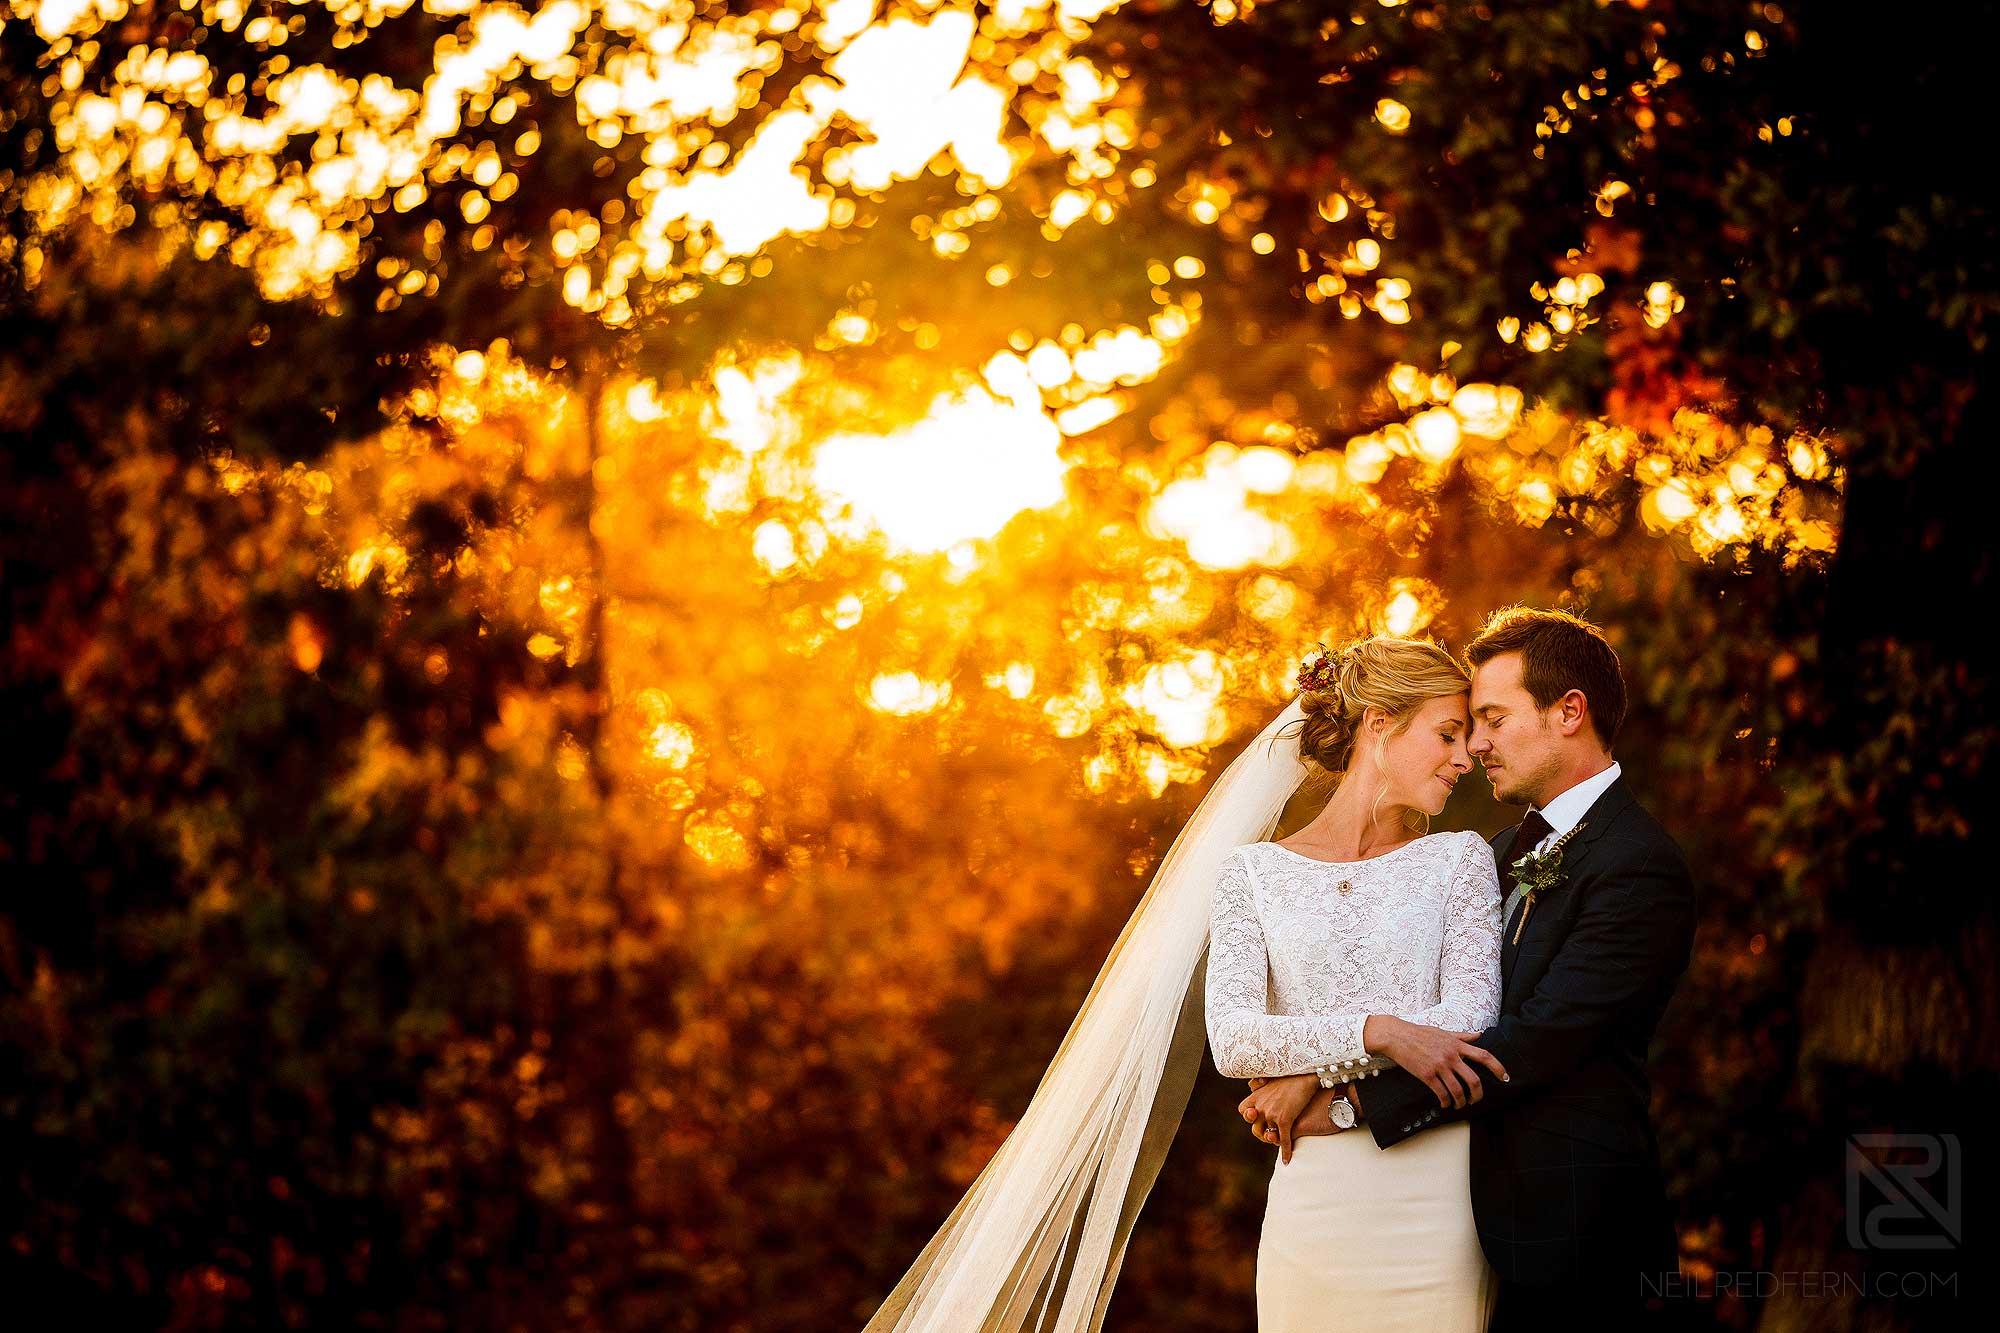 Neil Redfern Photography: Manchester Wedding Photographer